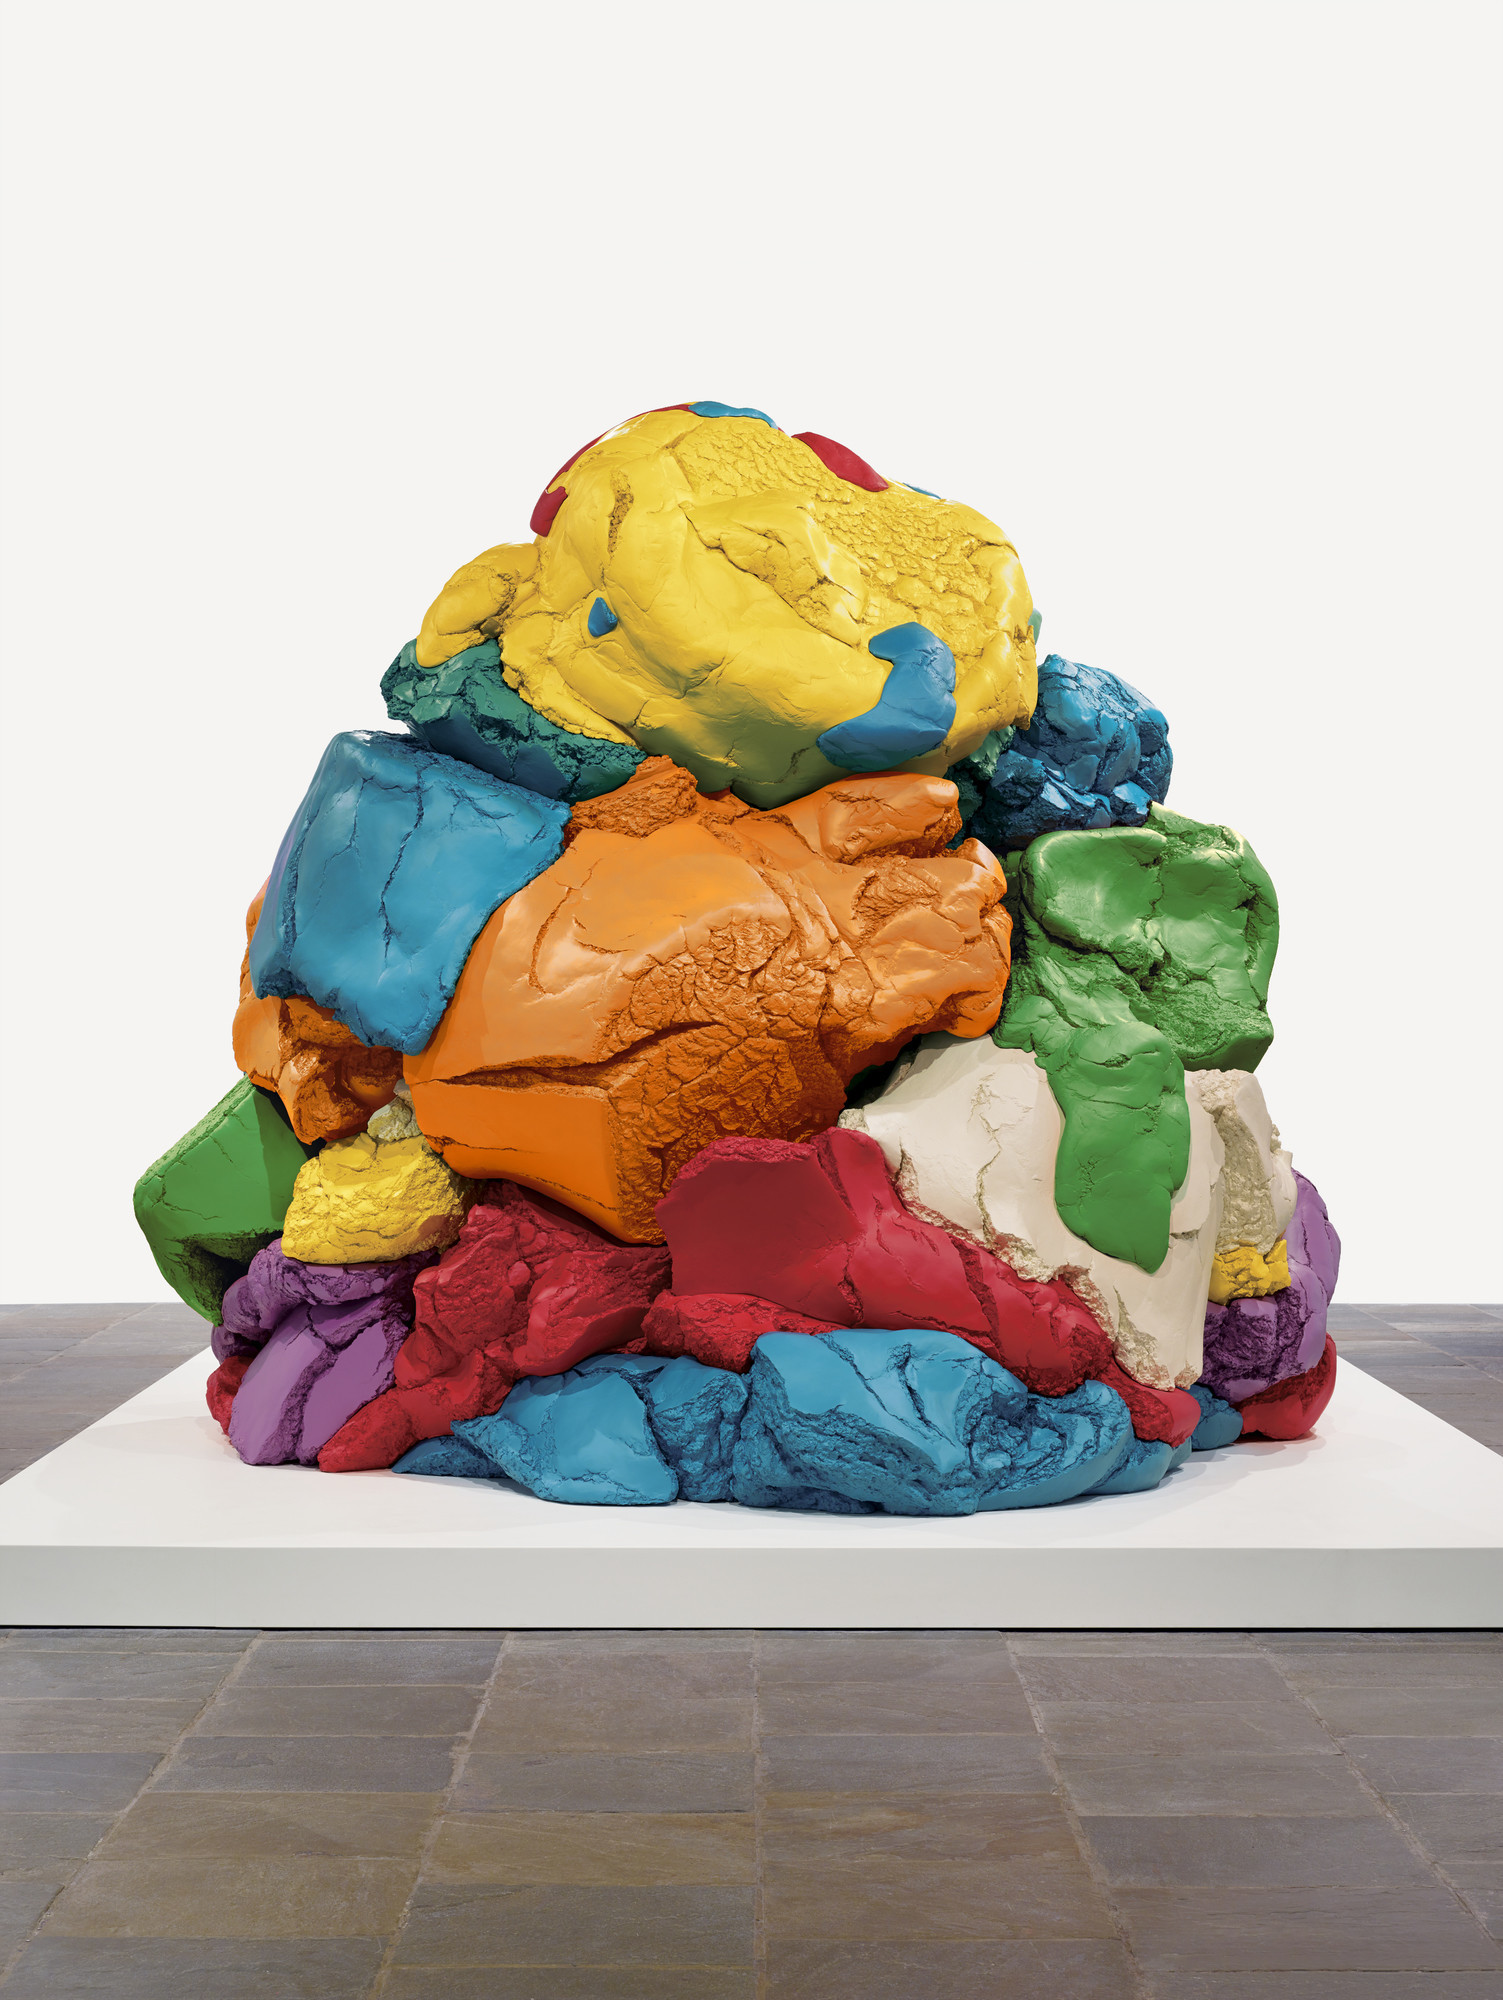 """Plato in L.A.: Contemporary Artists' Visions"""